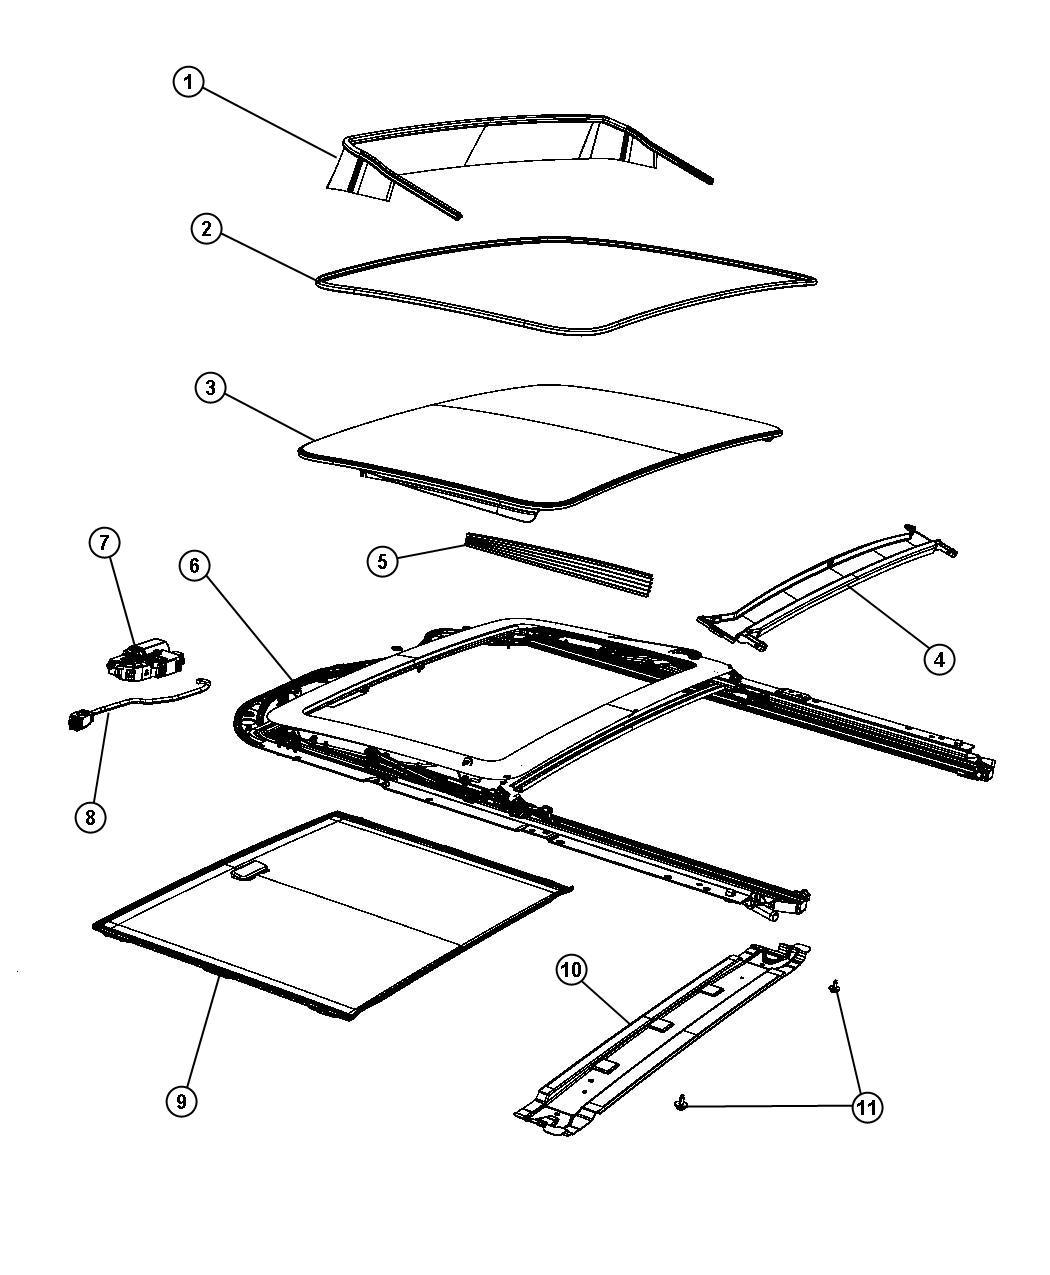 Jeep Grand Cherokee Sunroof Glass and Comonent Parts [GWA]